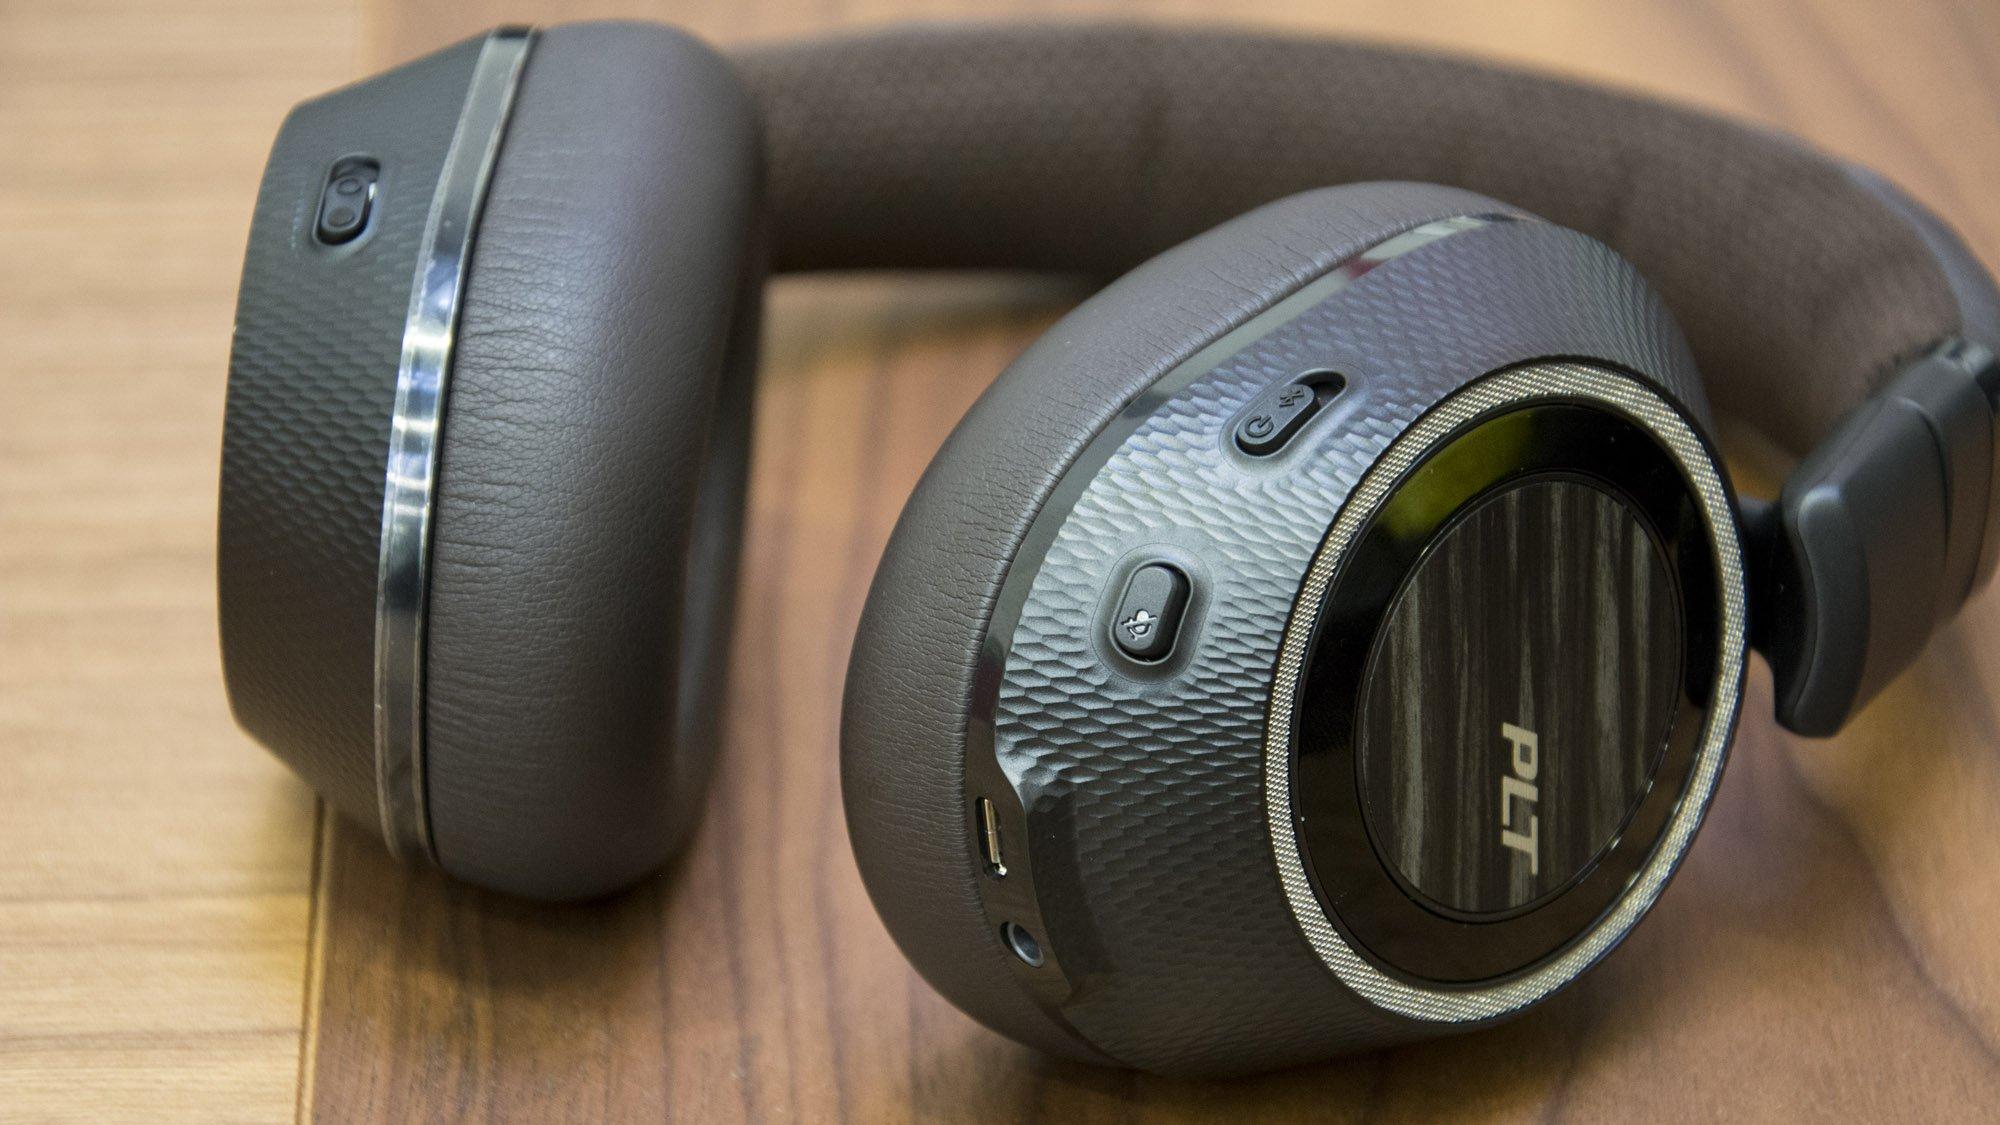 Plantronics Backbeat Pro 2 review: The best sub-£200 ANC headphones